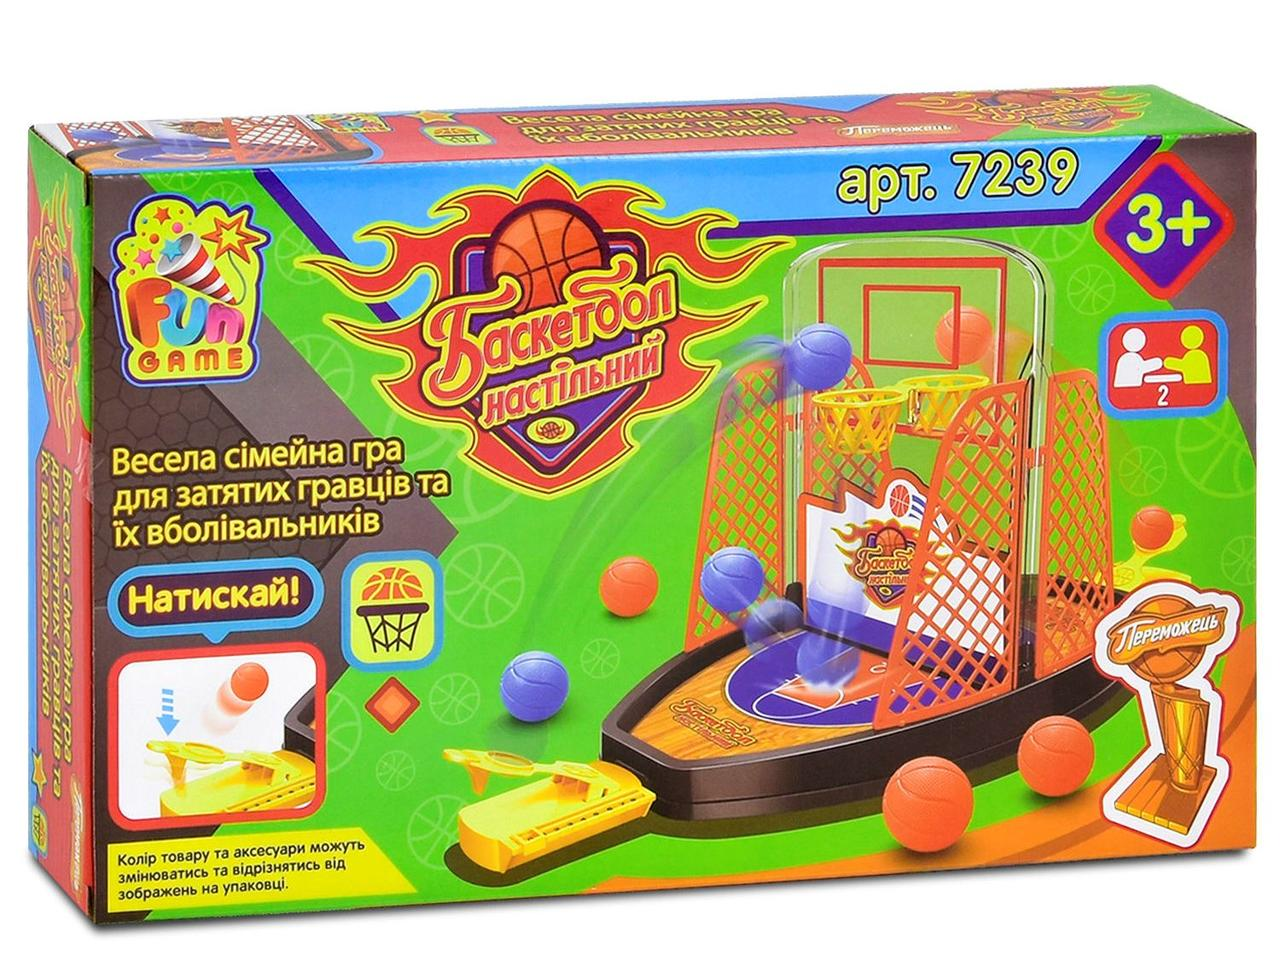 "Настольная игра ""Баскетбол"" FUN GAME 7239"